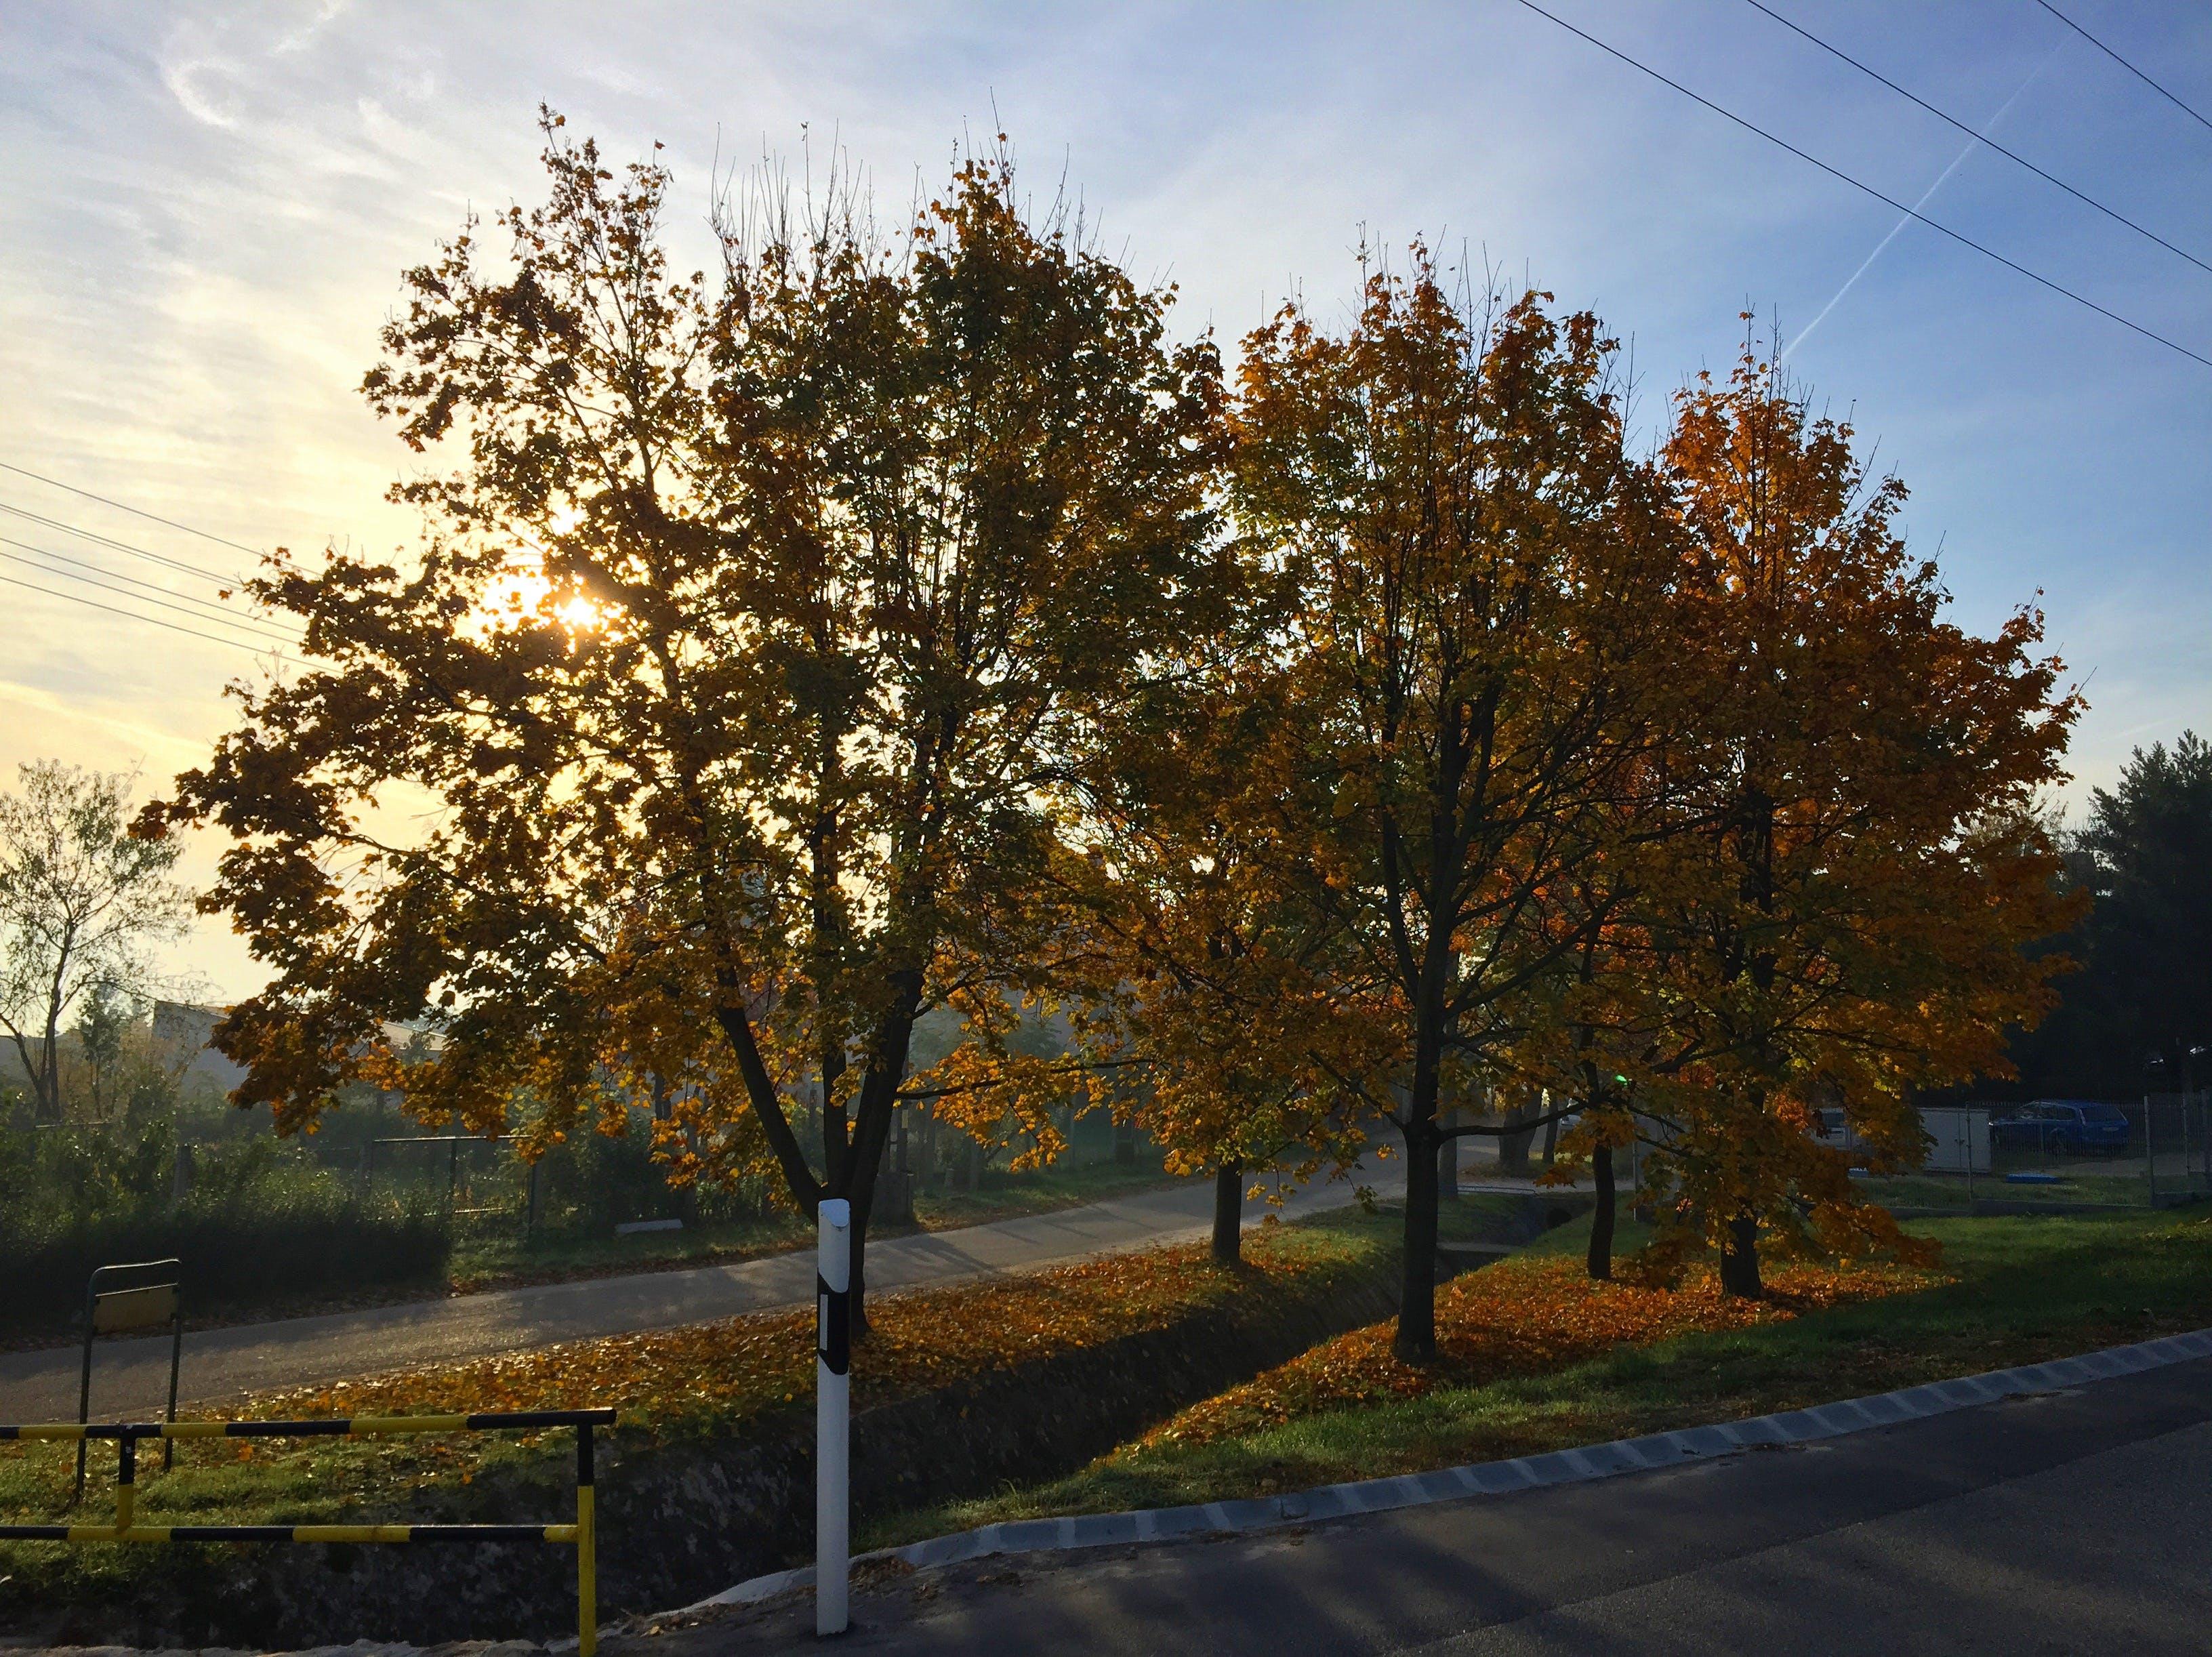 Free stock photo of #autumn #nature #naturephoto #color